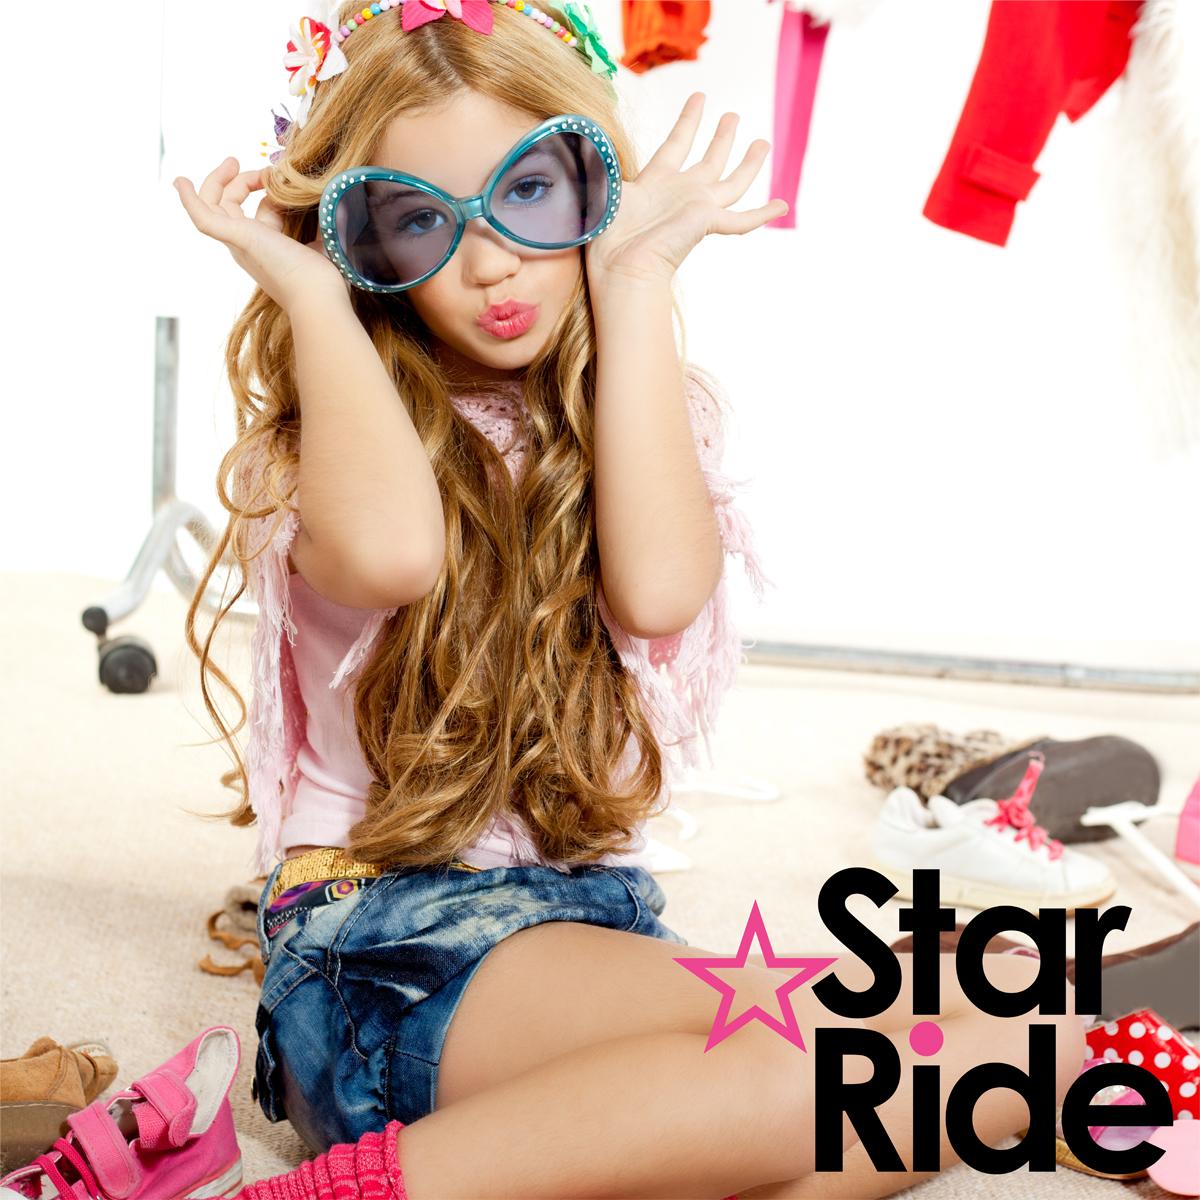 STARRIDE GIRL_020317_W_LOGO_4X4.jpg